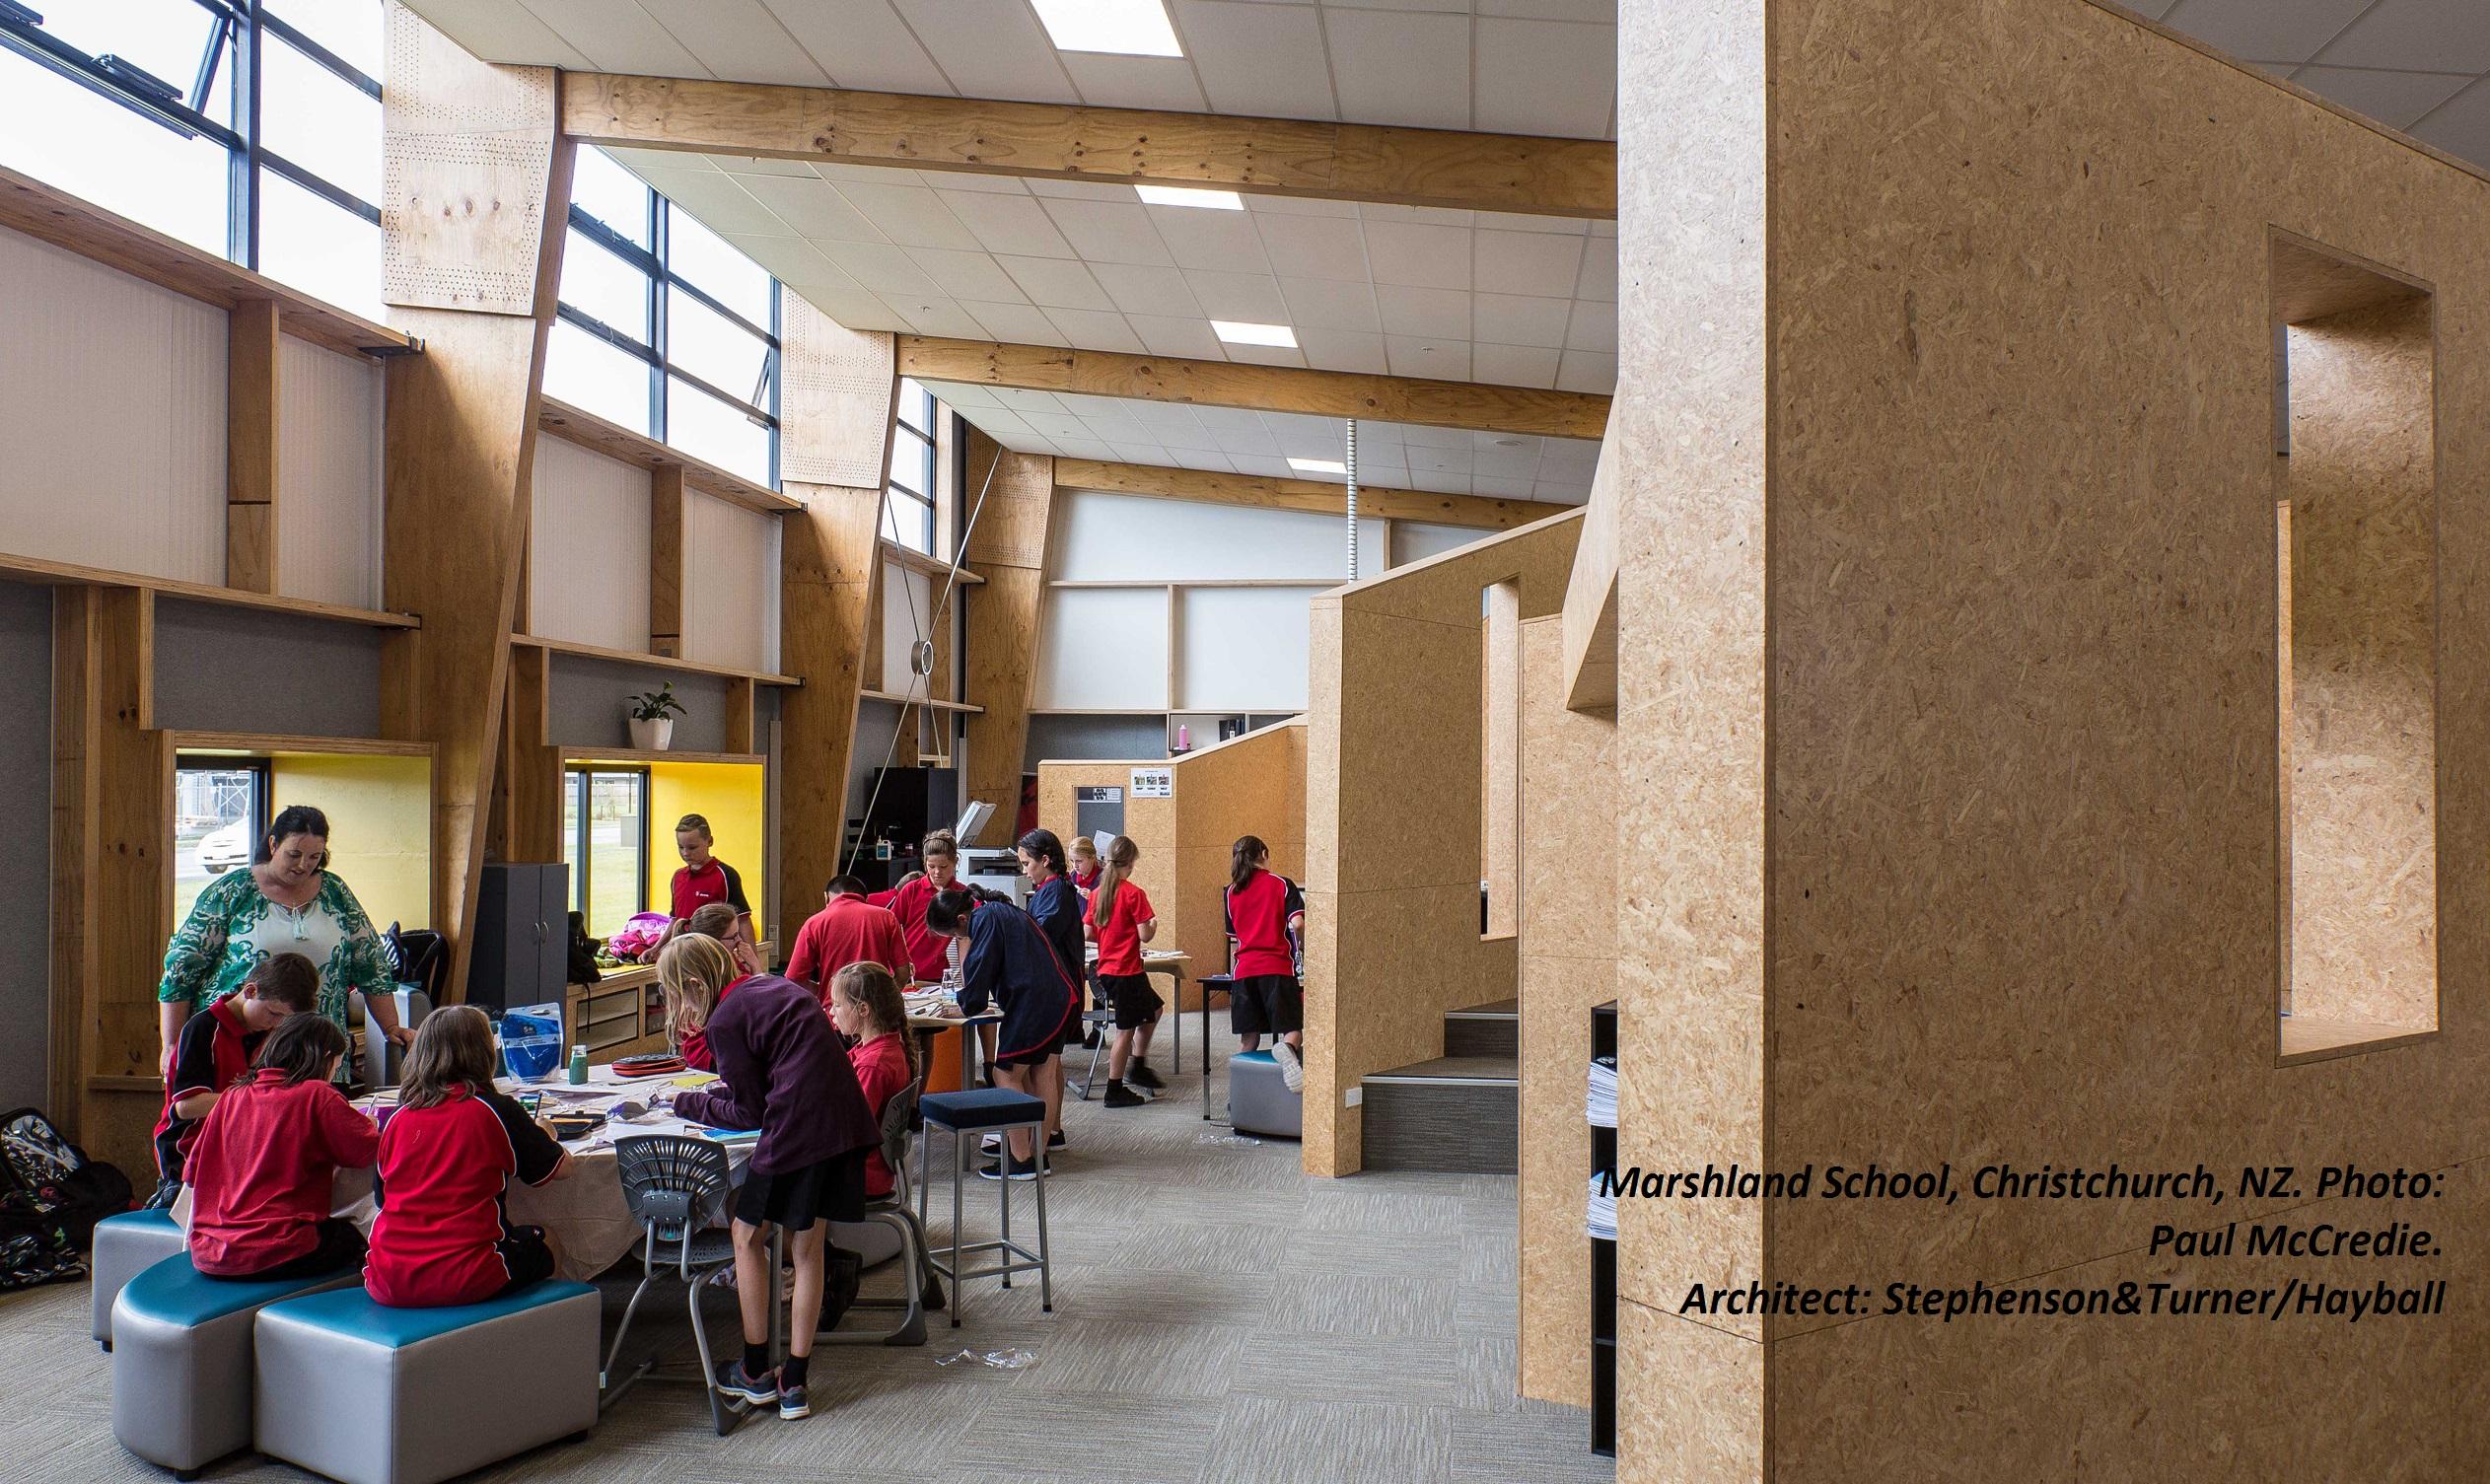 Transitions inhabiting innovative learning environments